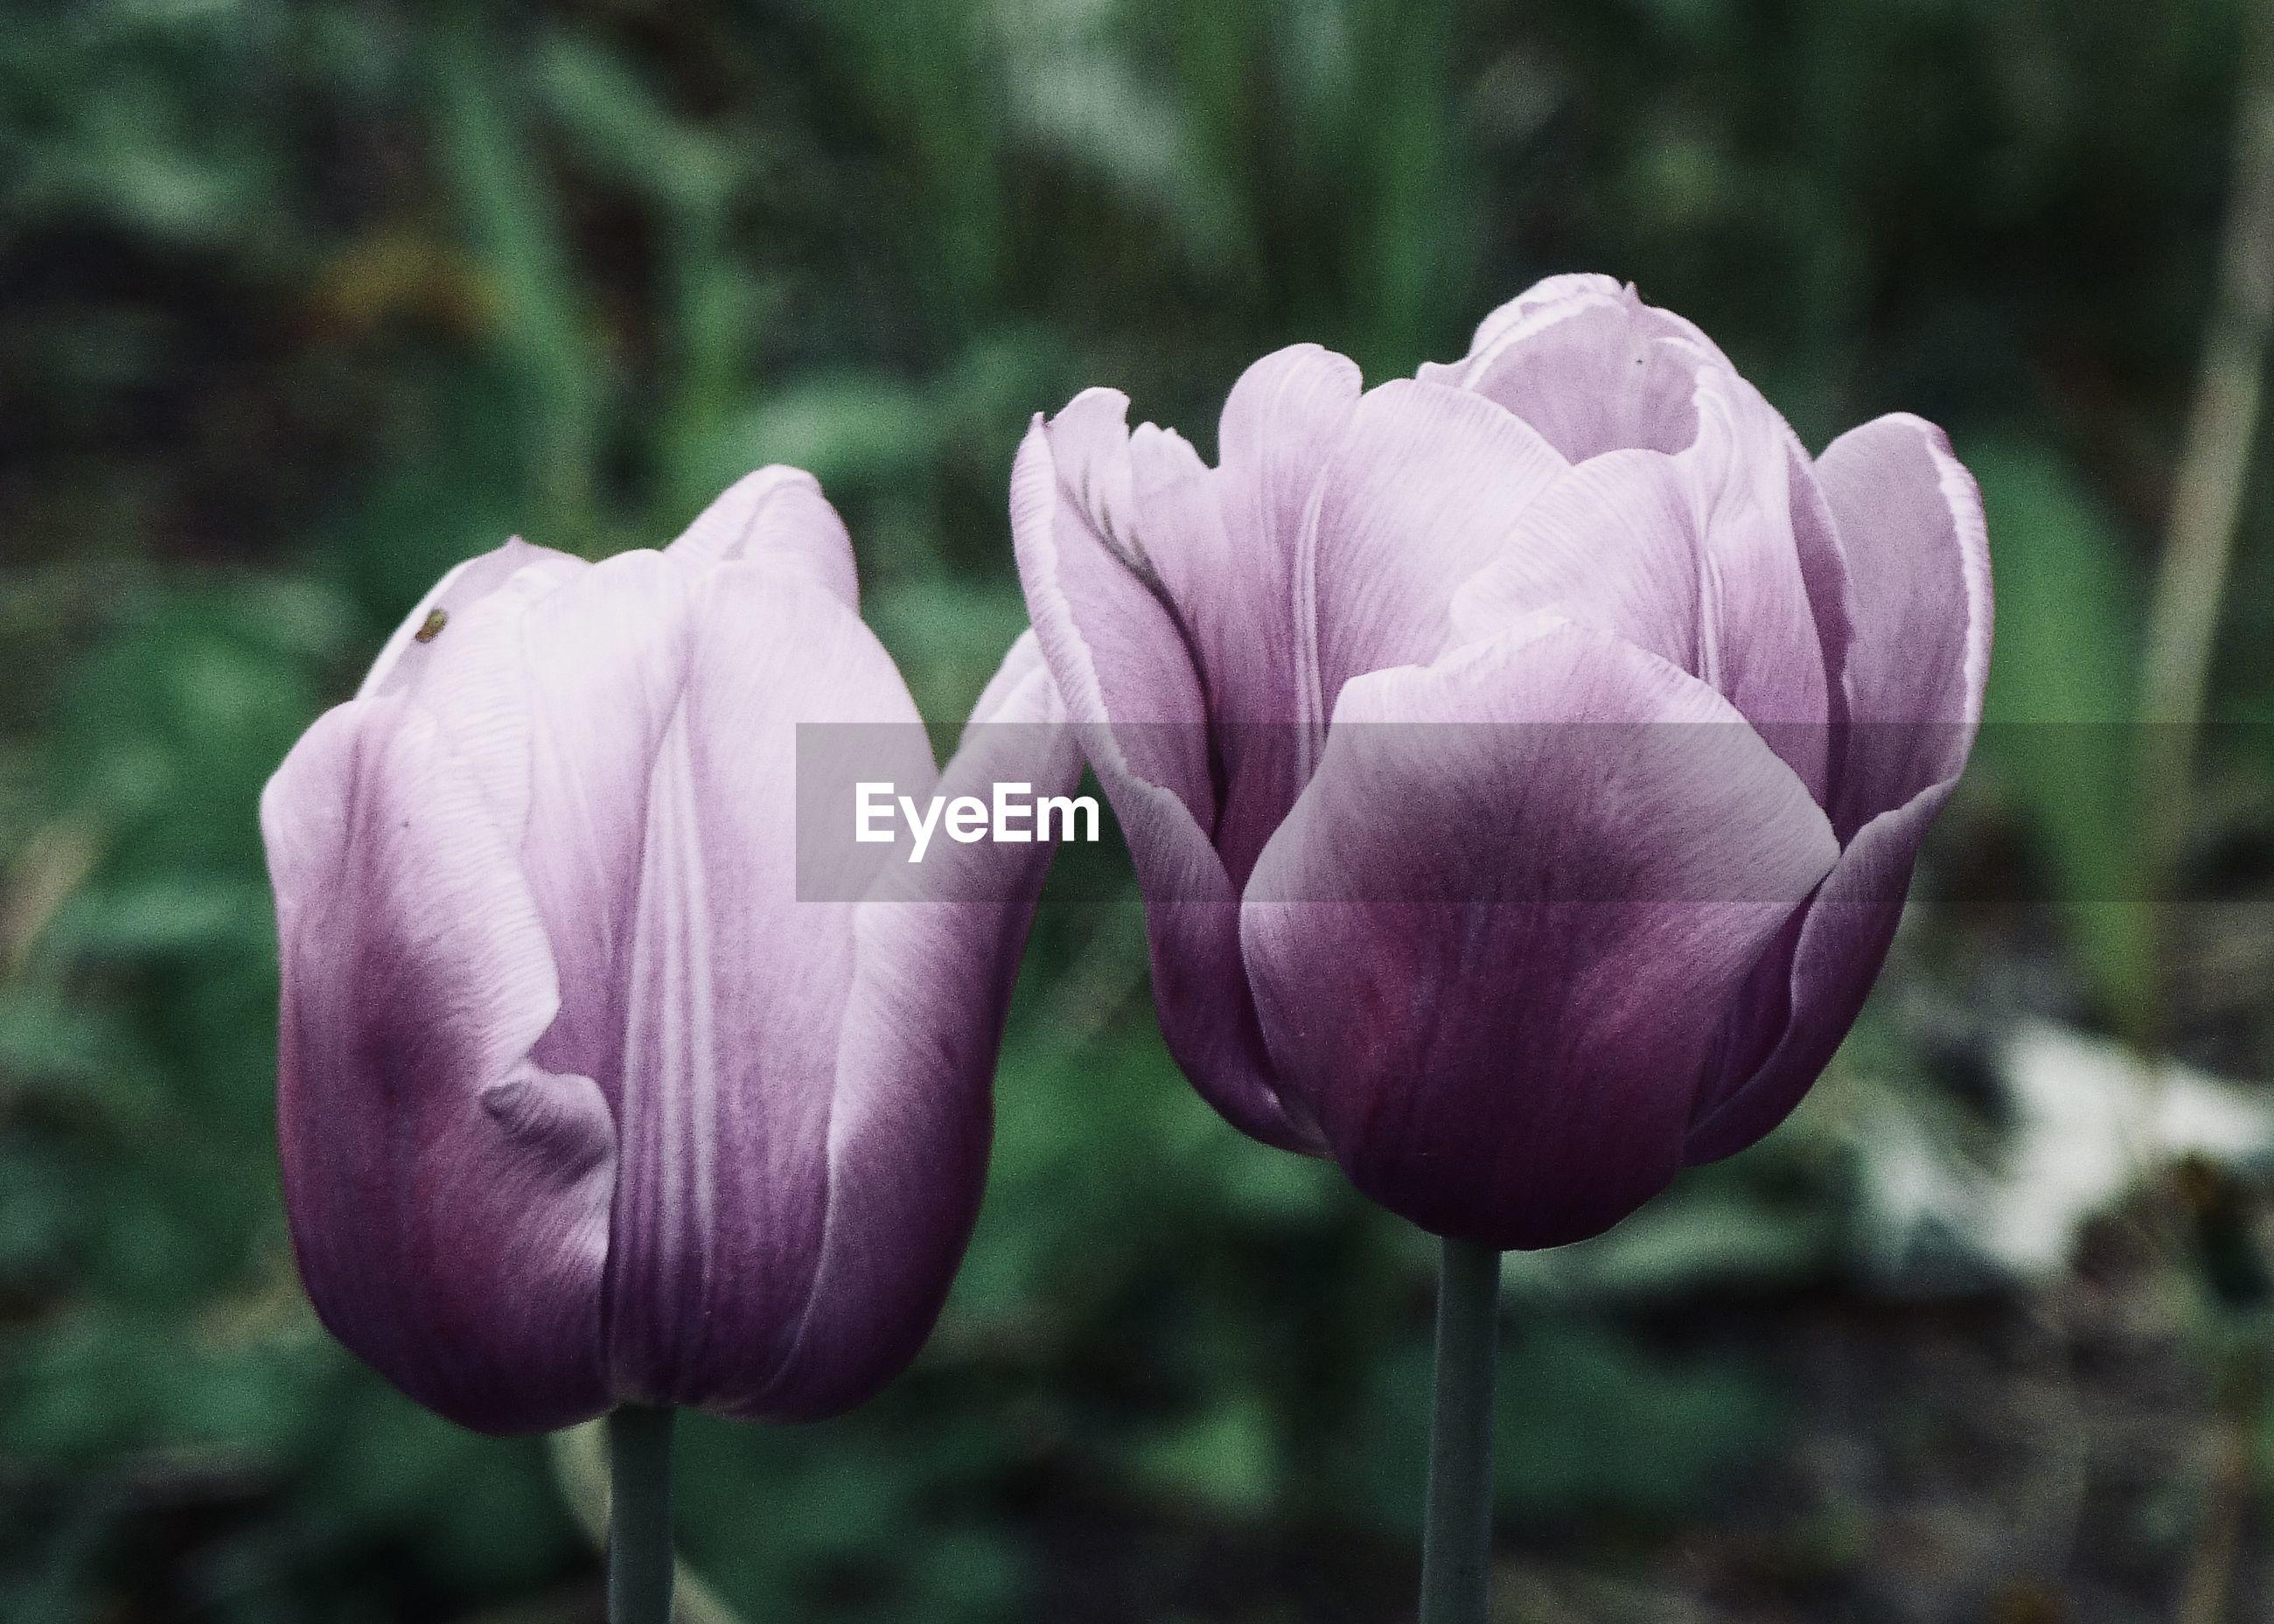 CLOSE-UP OF PURPLE TULIP FLOWER